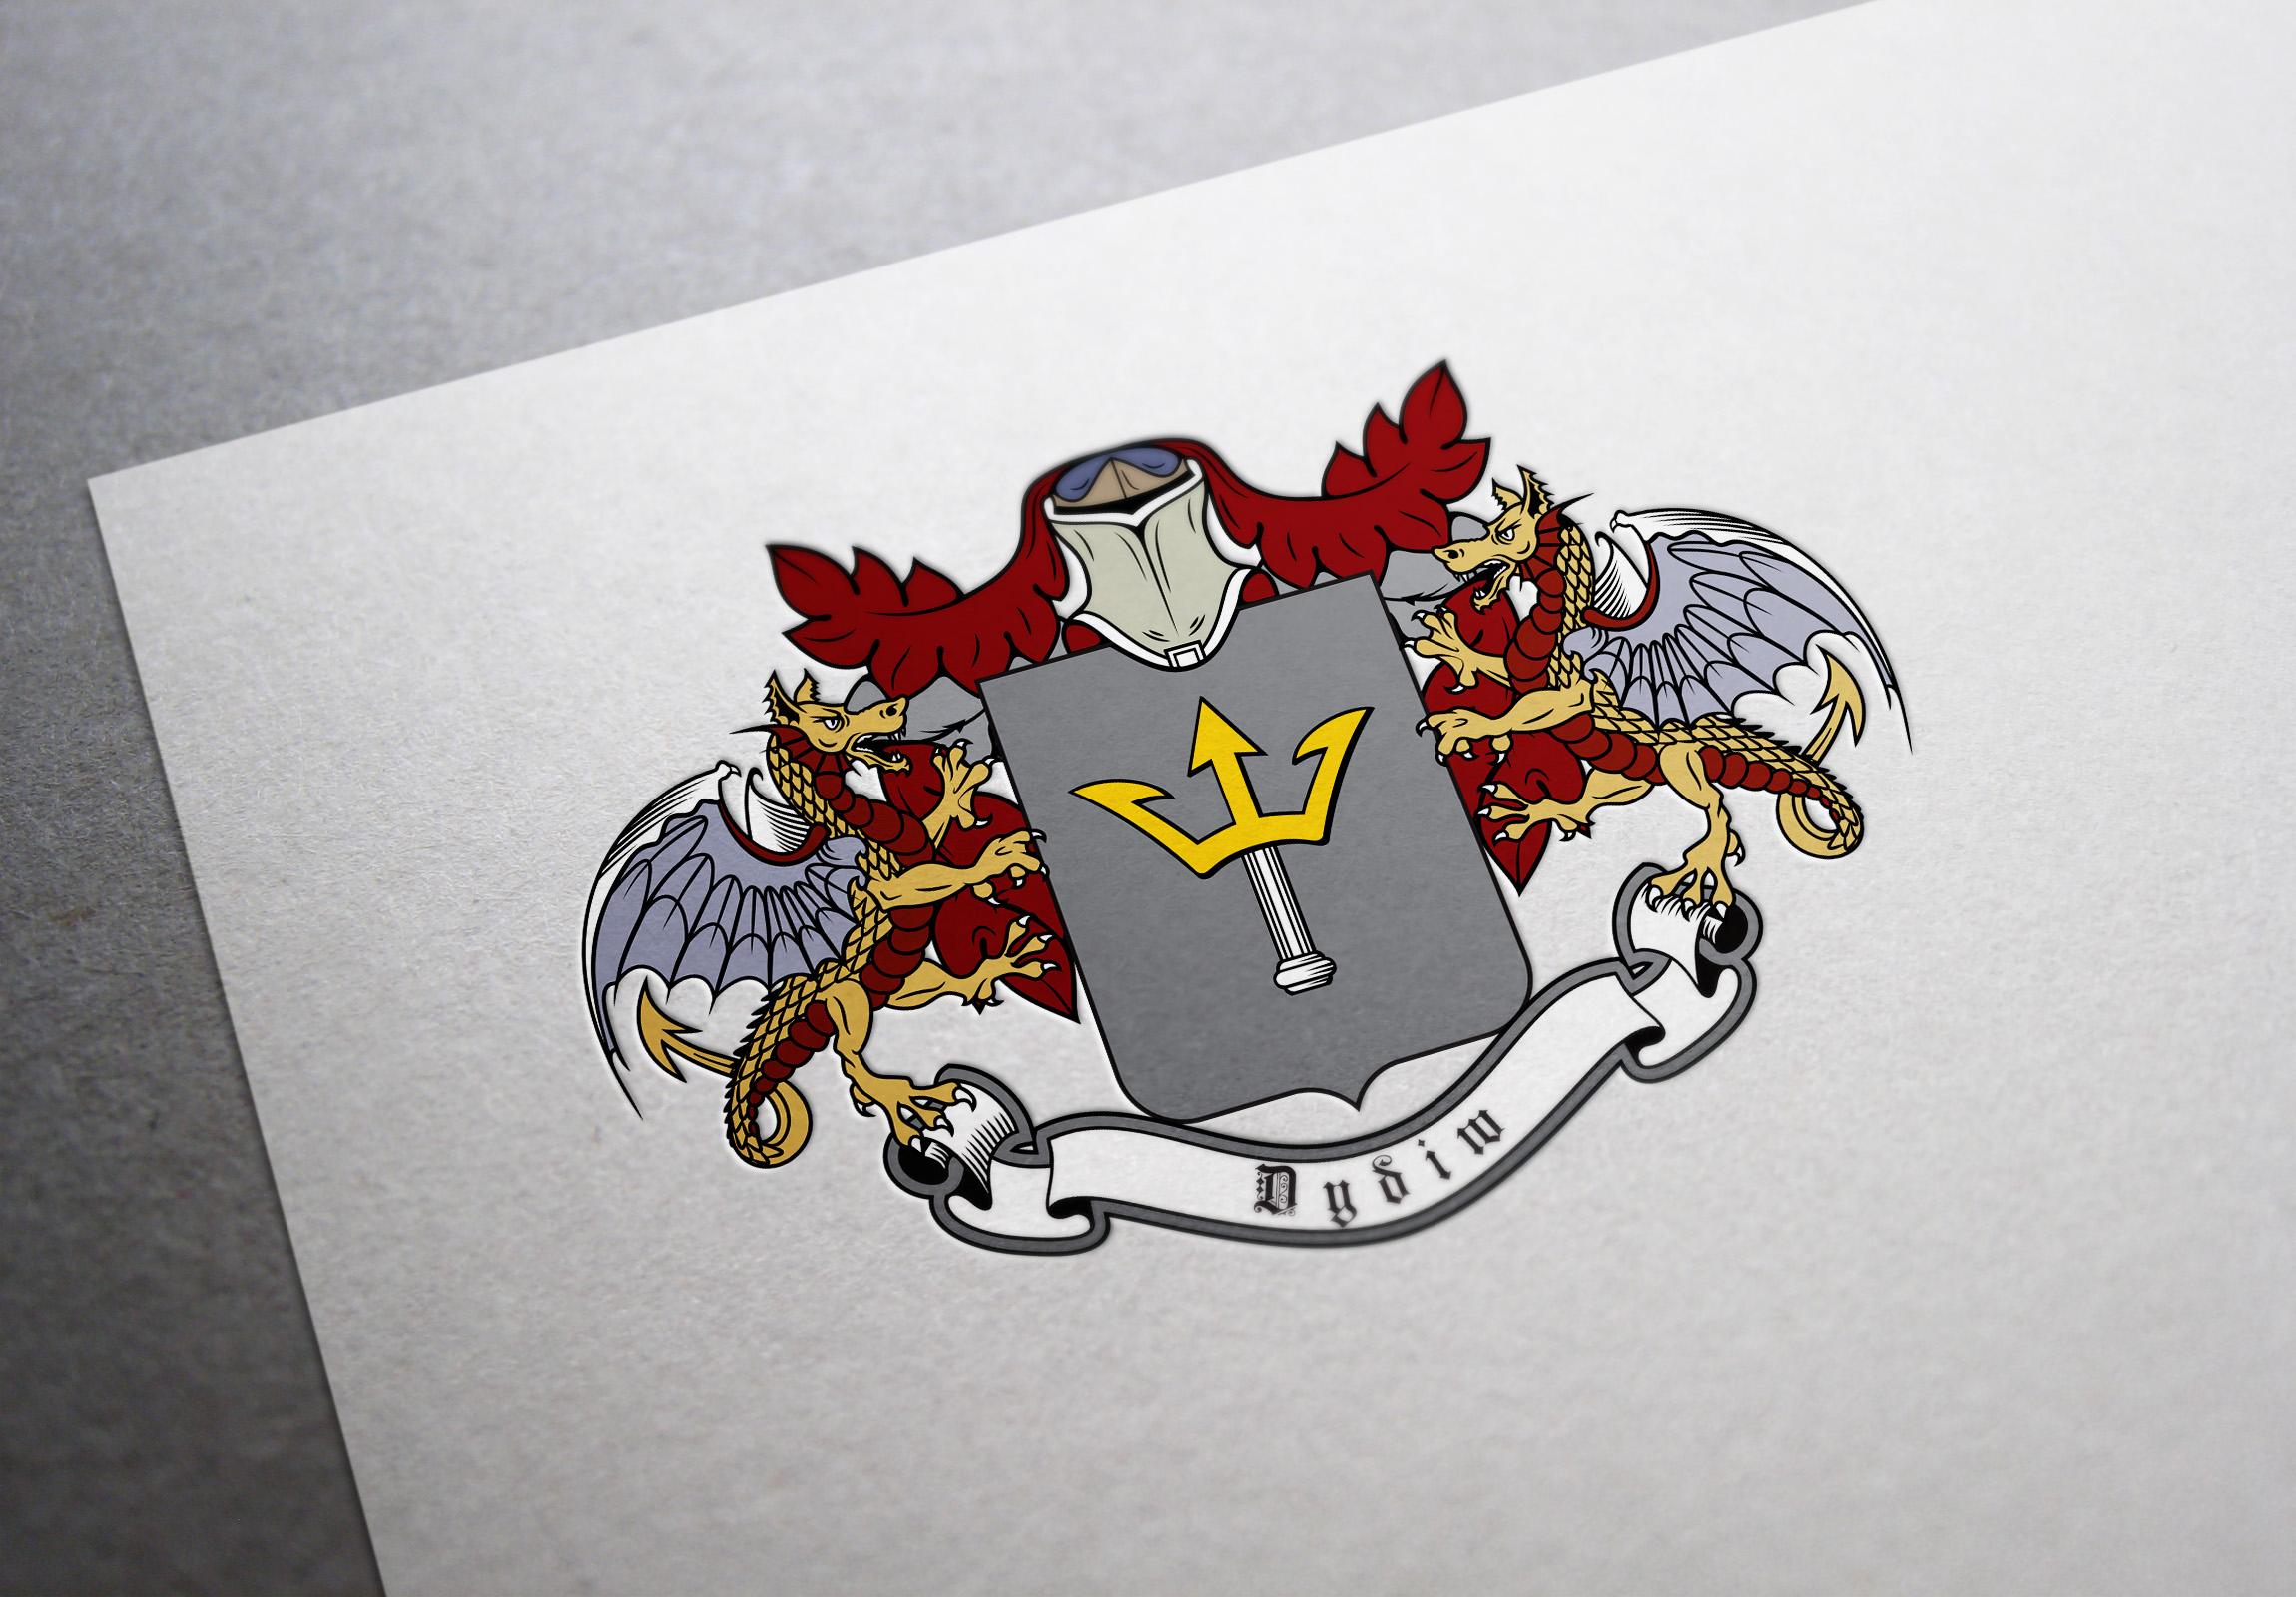 Scottish sailors coat of arms